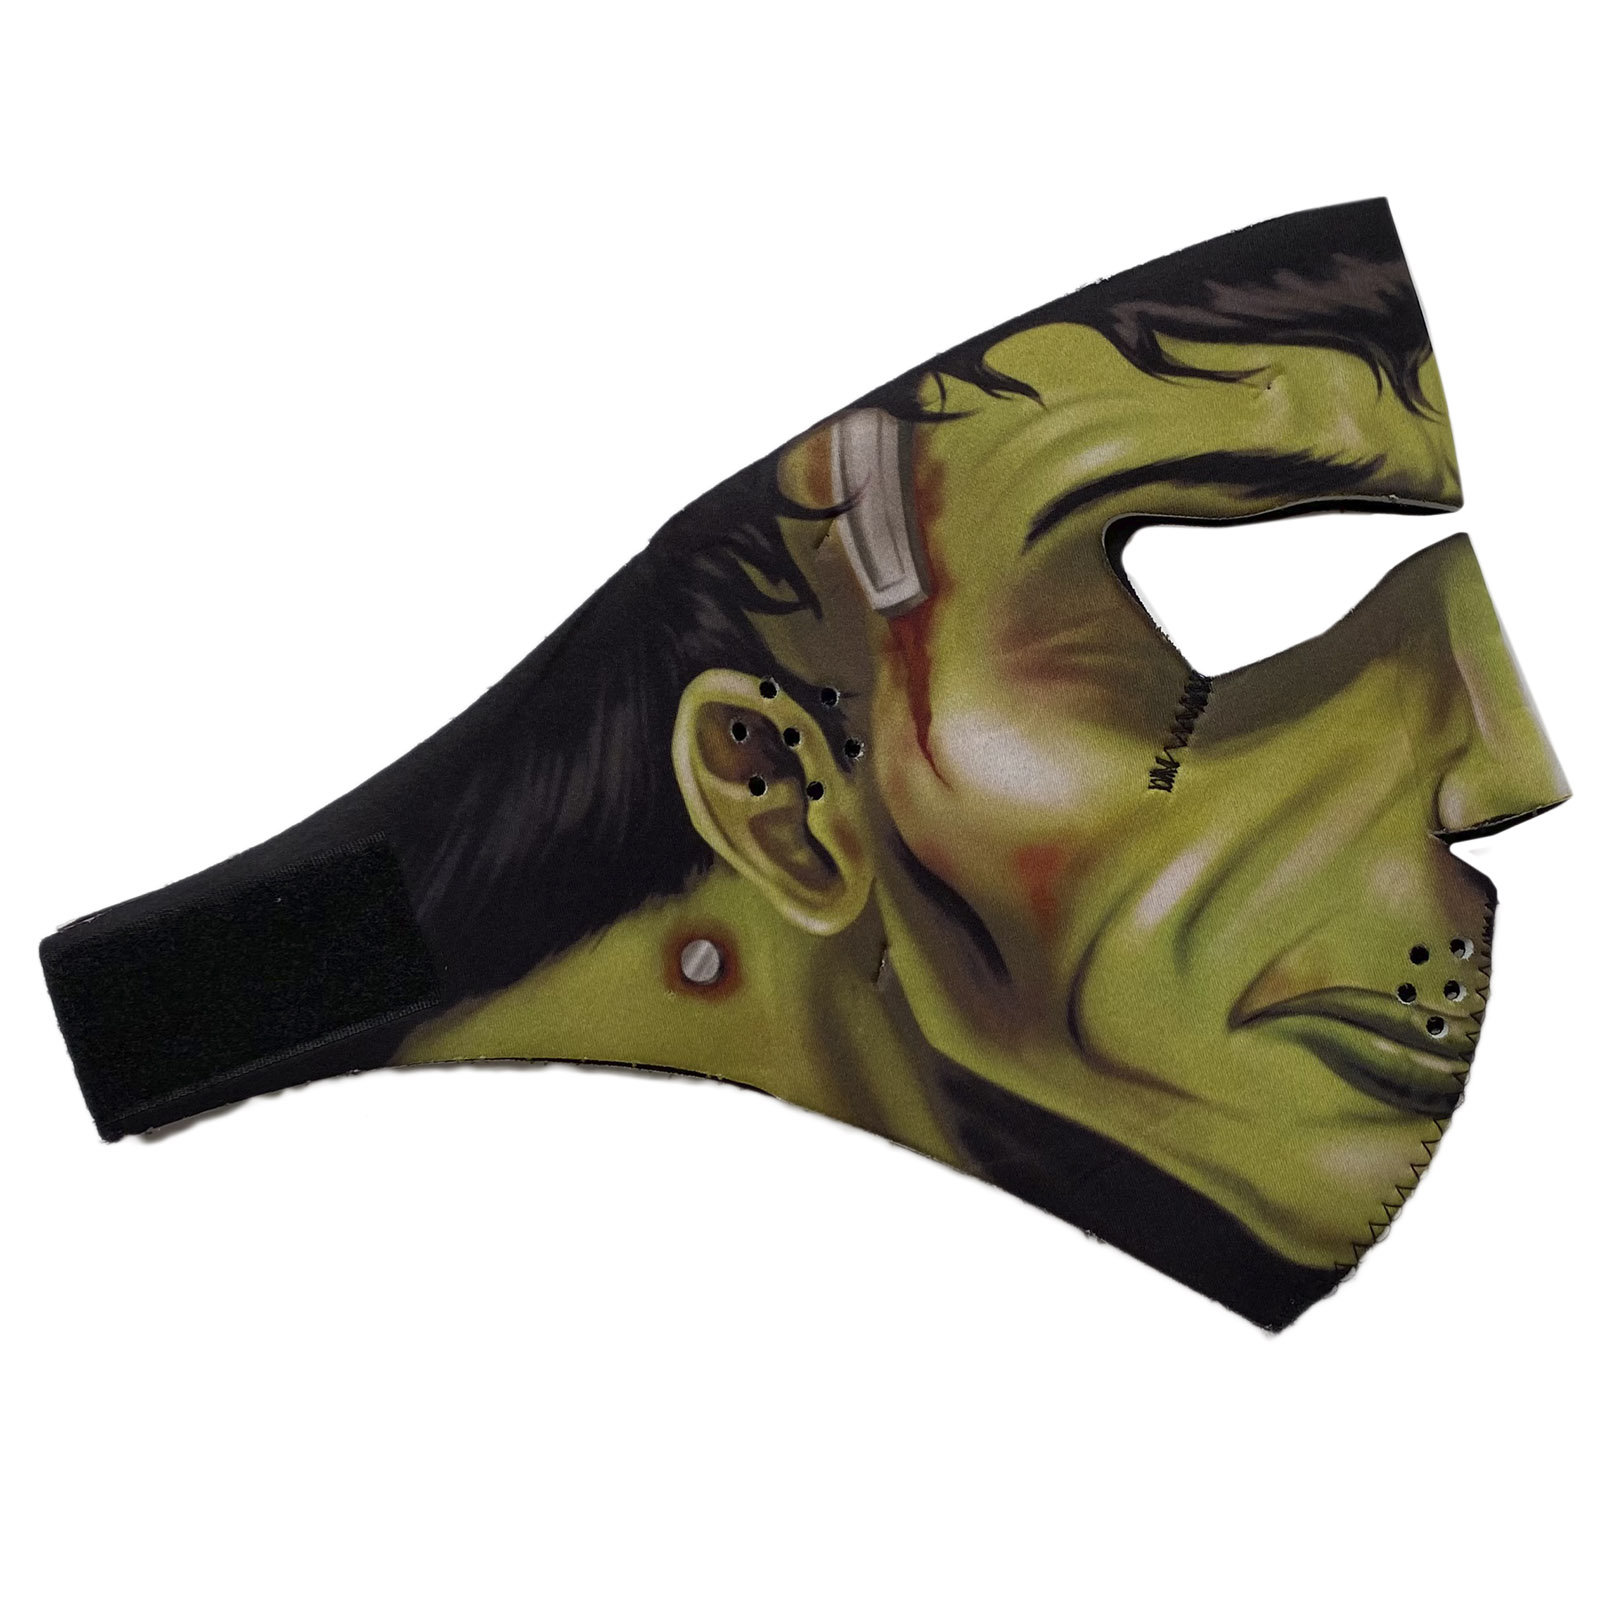 Многоразовая полнолицевая антивирусная маска Wild Wear Undertaker